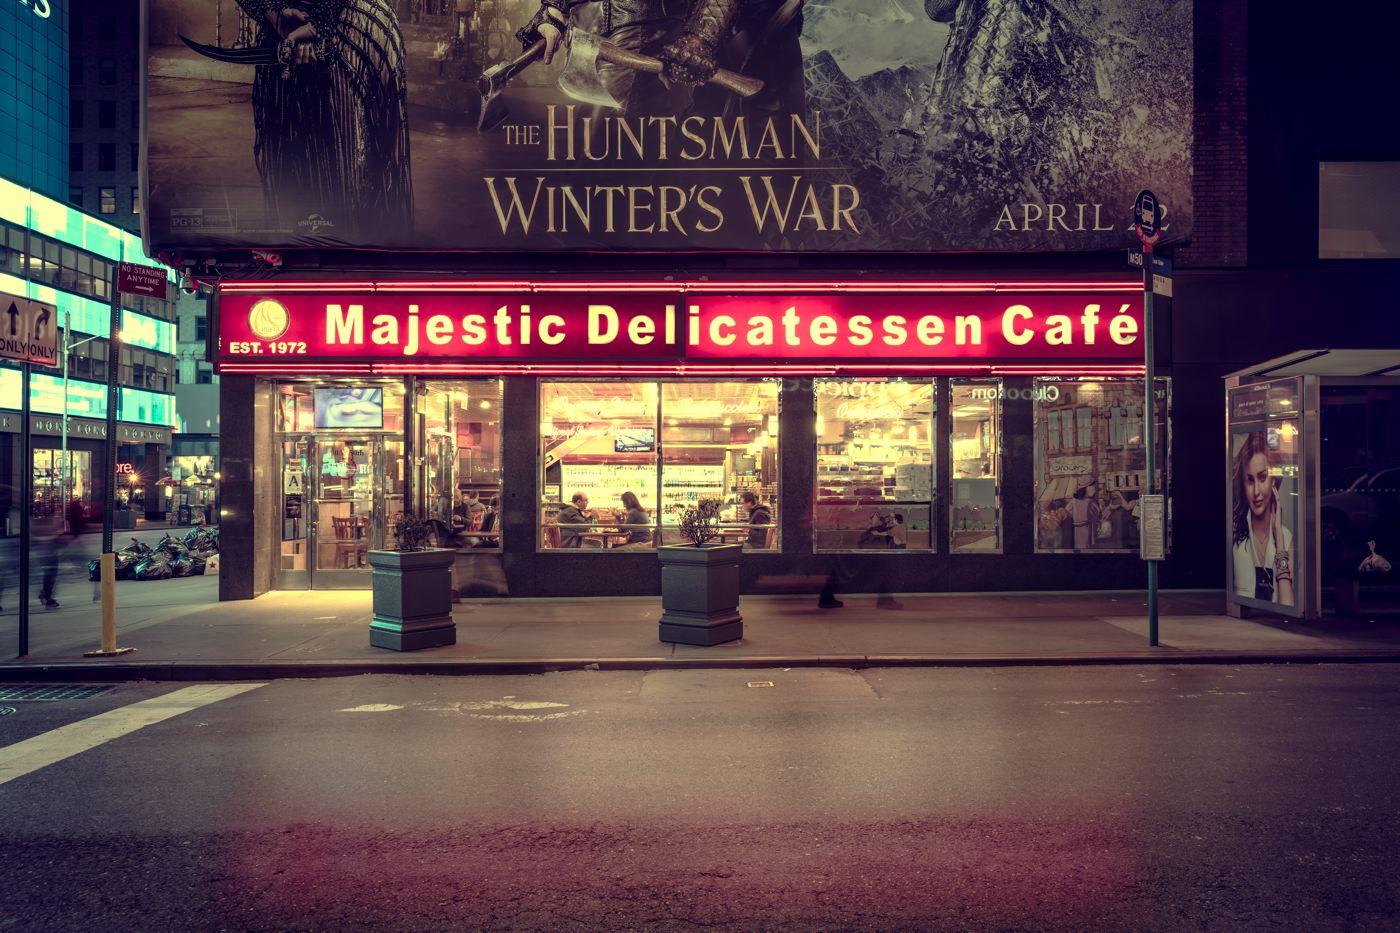 LDKphoto-NYC - Majestic Delicatessen Café - 02.jpg